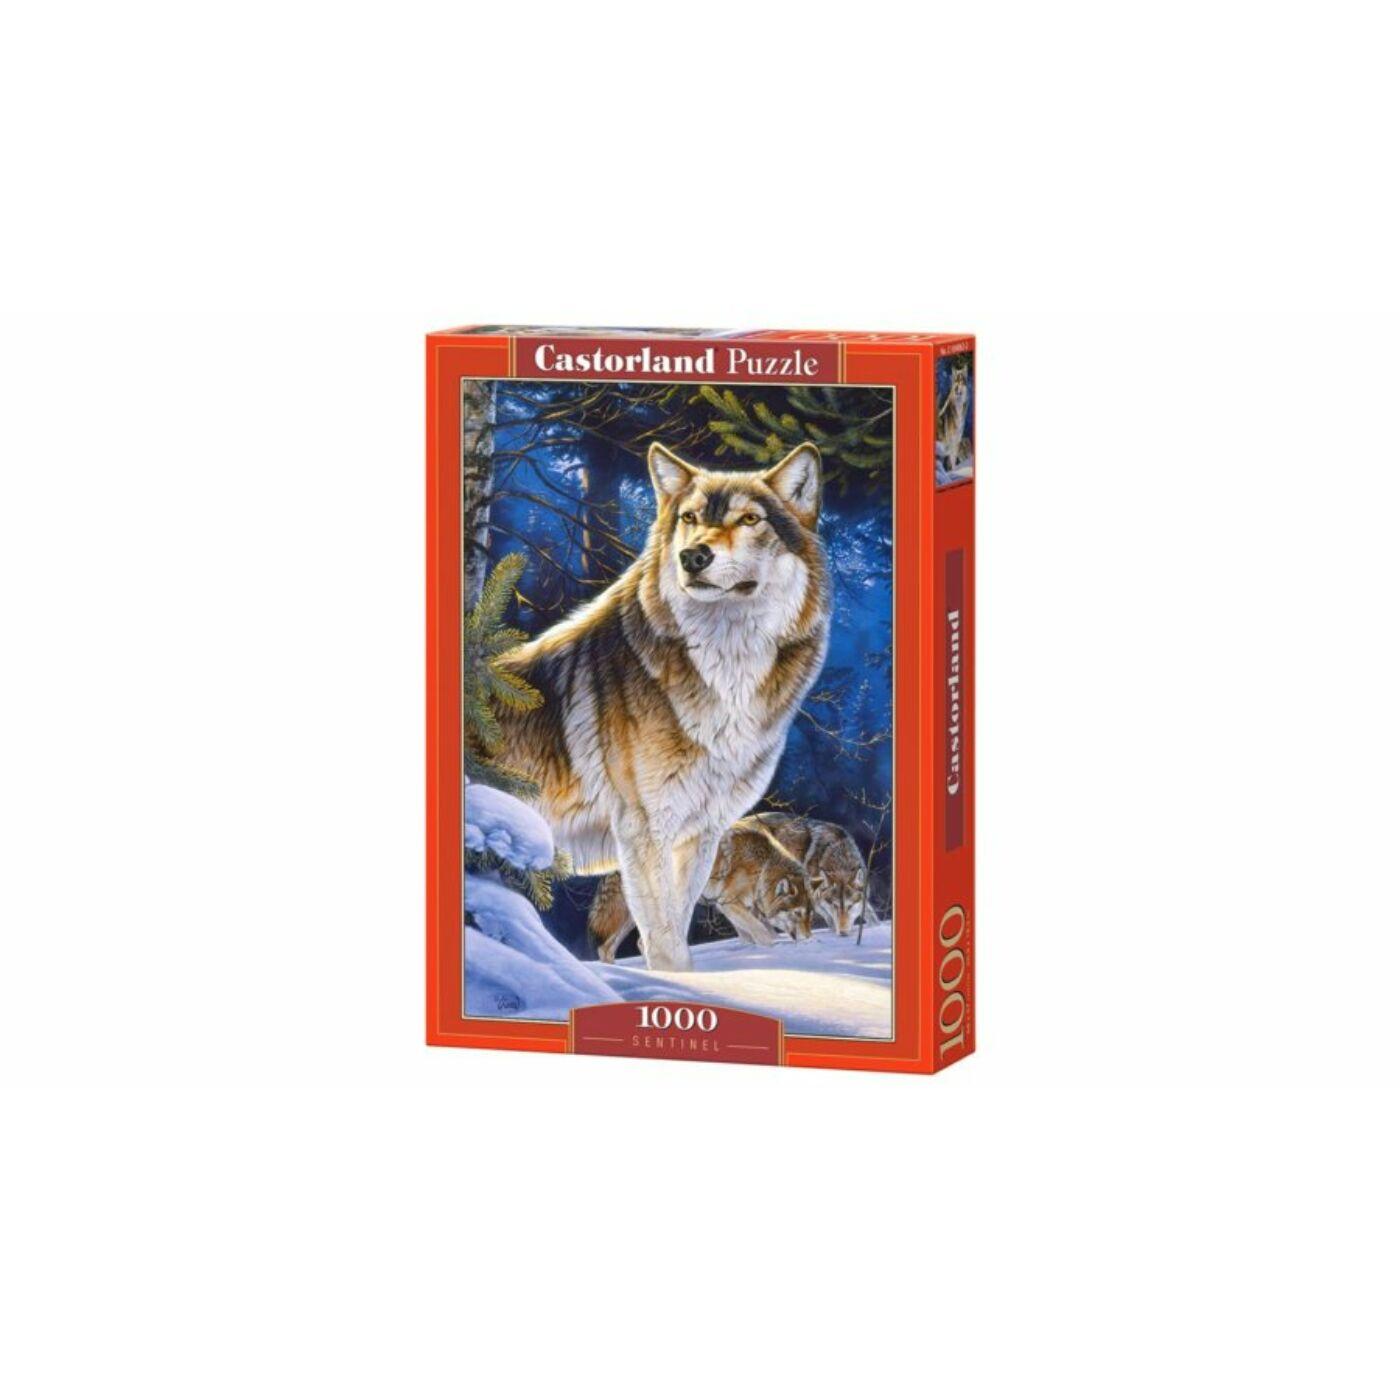 1000 db-os Castorland Puzzle - Őrszem